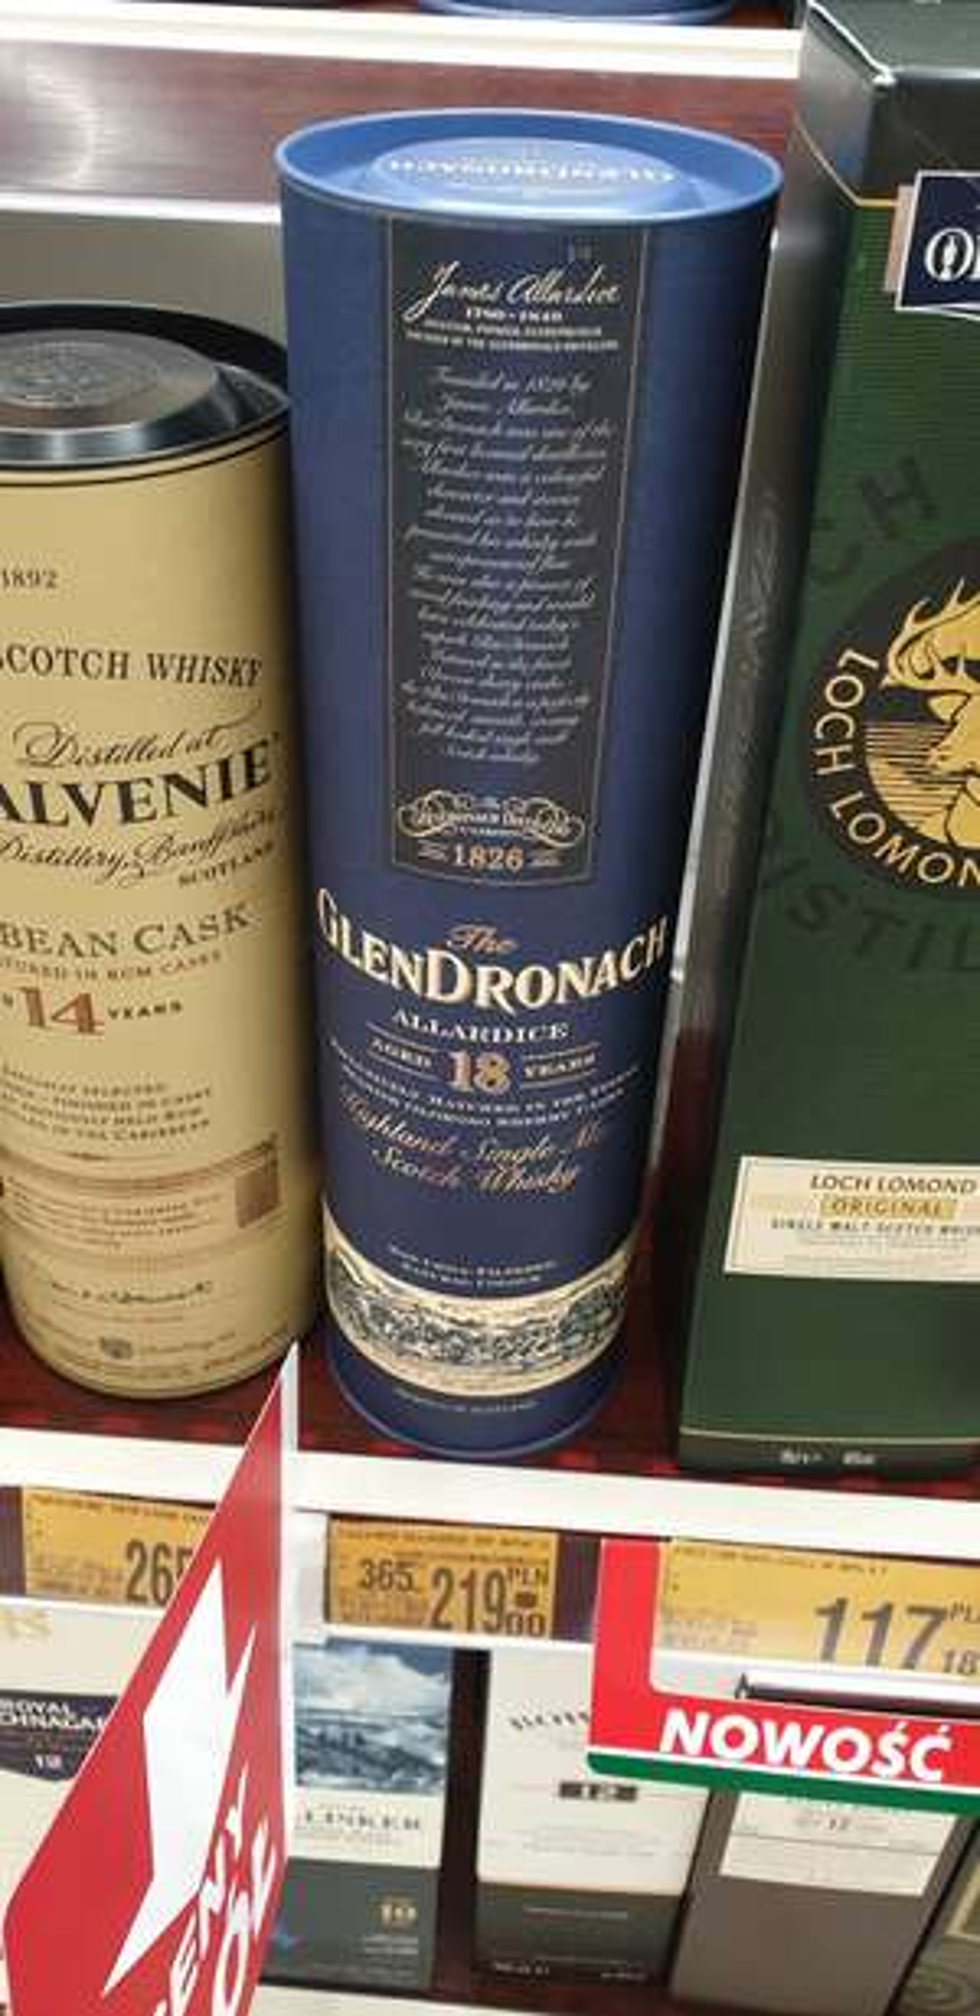 GlenDronach 18 M1 zabrze